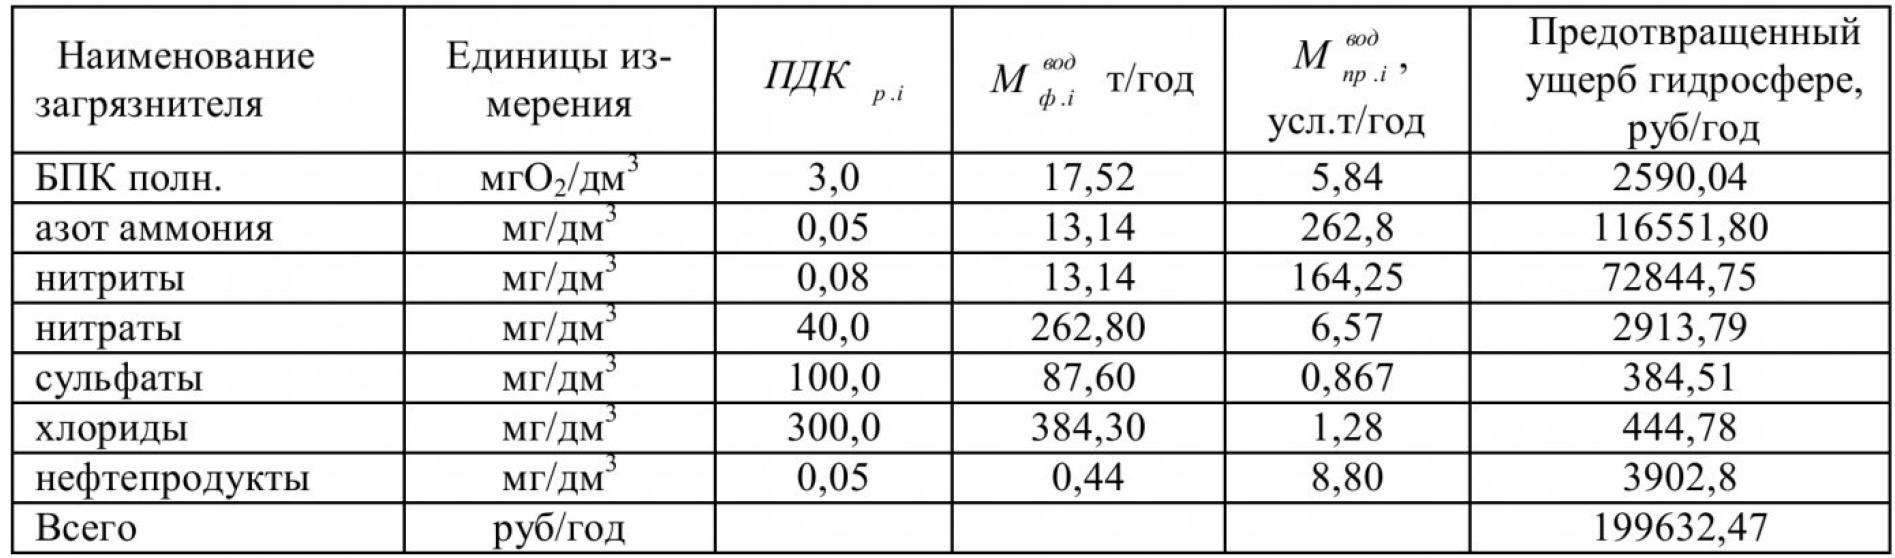 Таблица 1 – Предотвращенный ущерб гидросфере